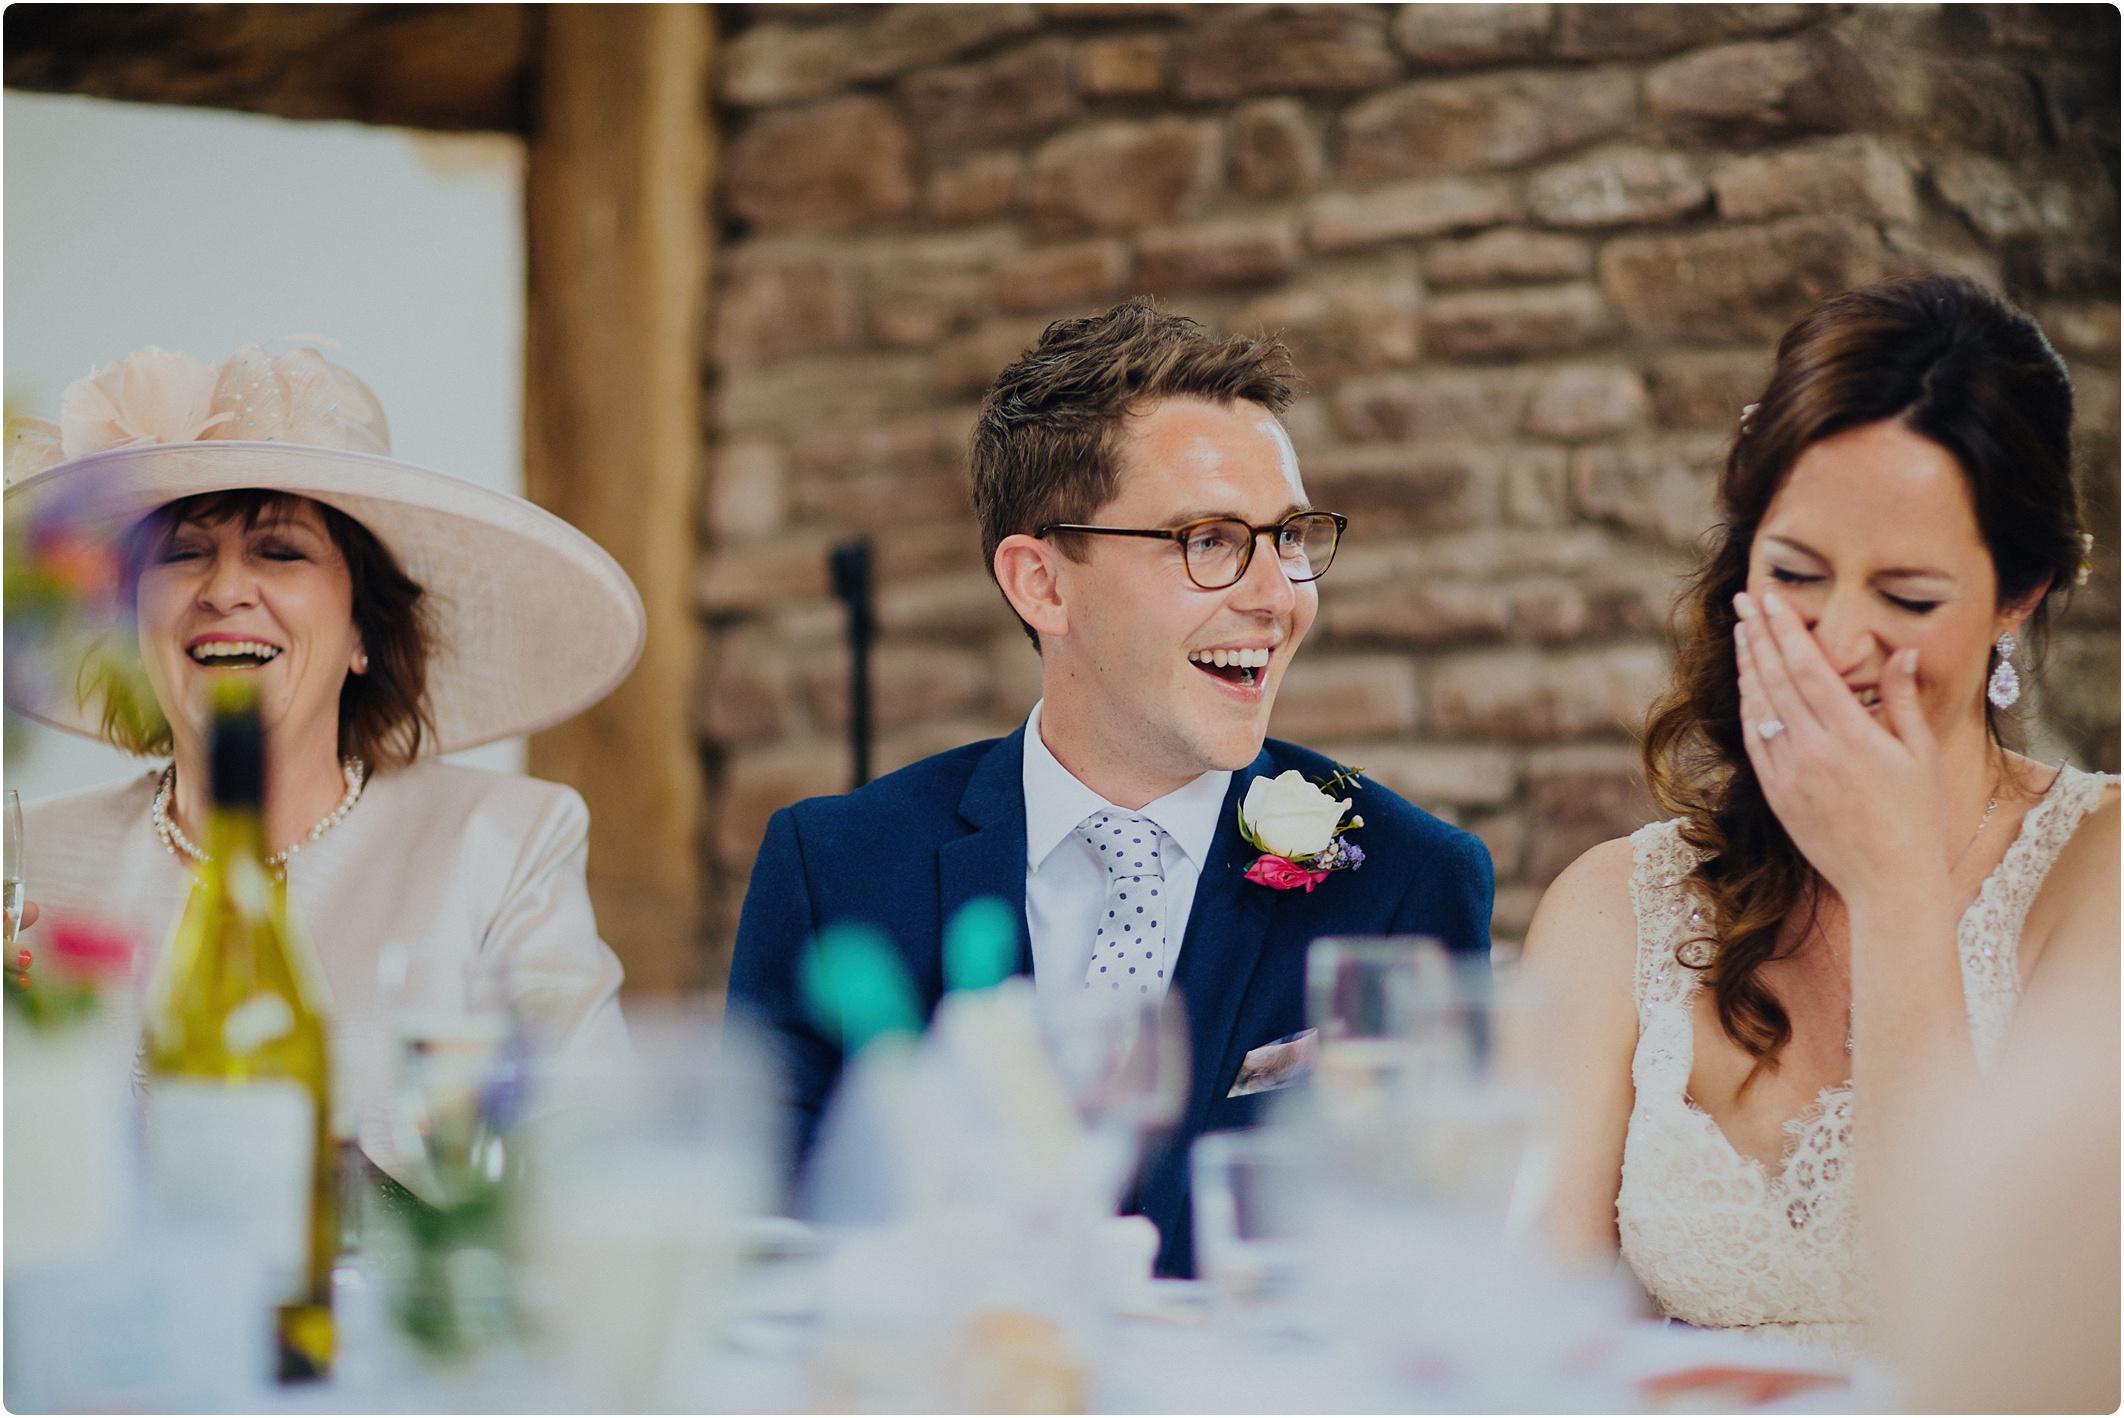 Treadam Barn Wedding speeches